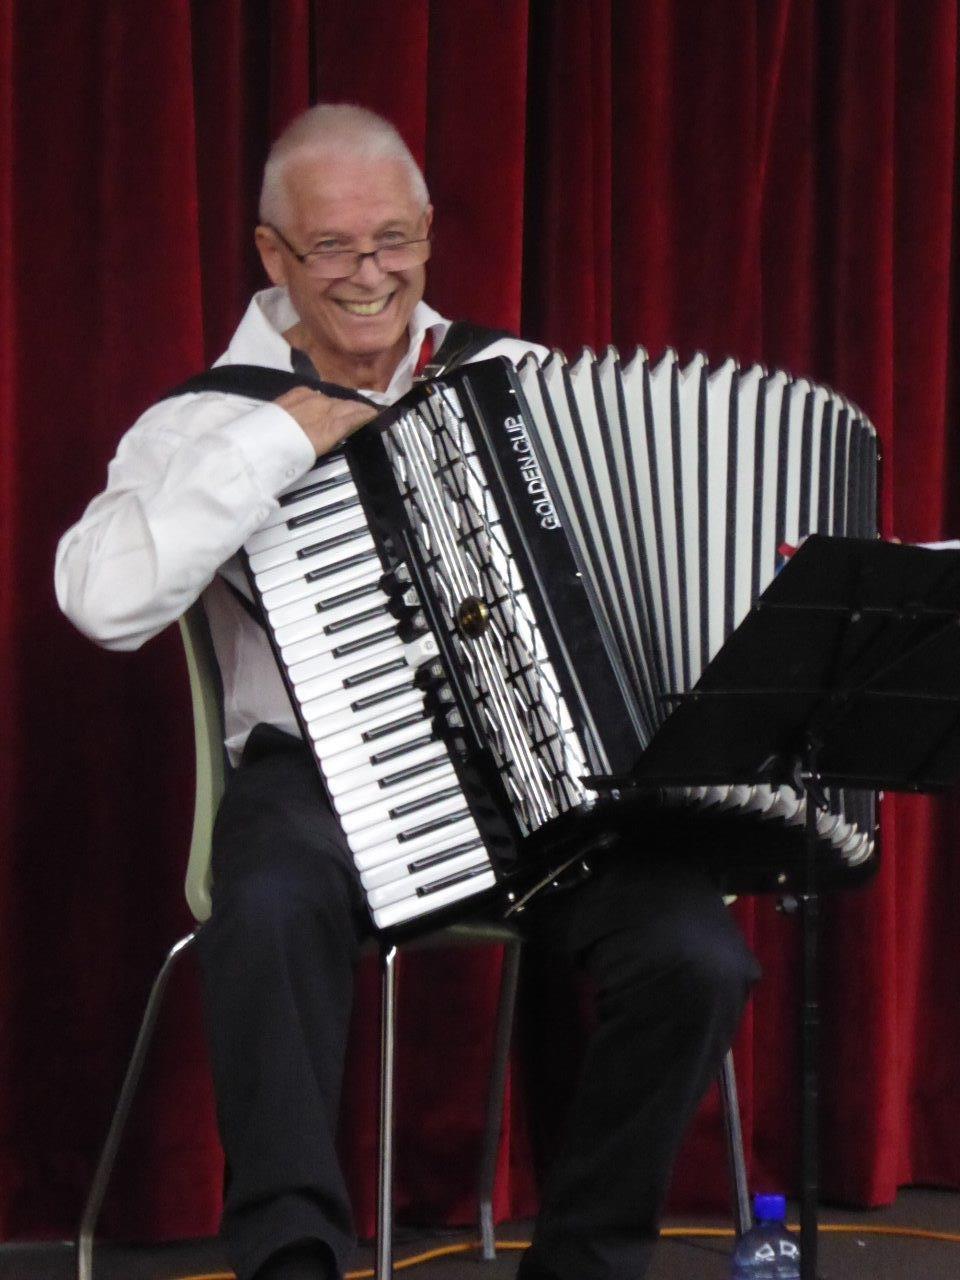 Francesco Sofo enjoys playing the piano accordion